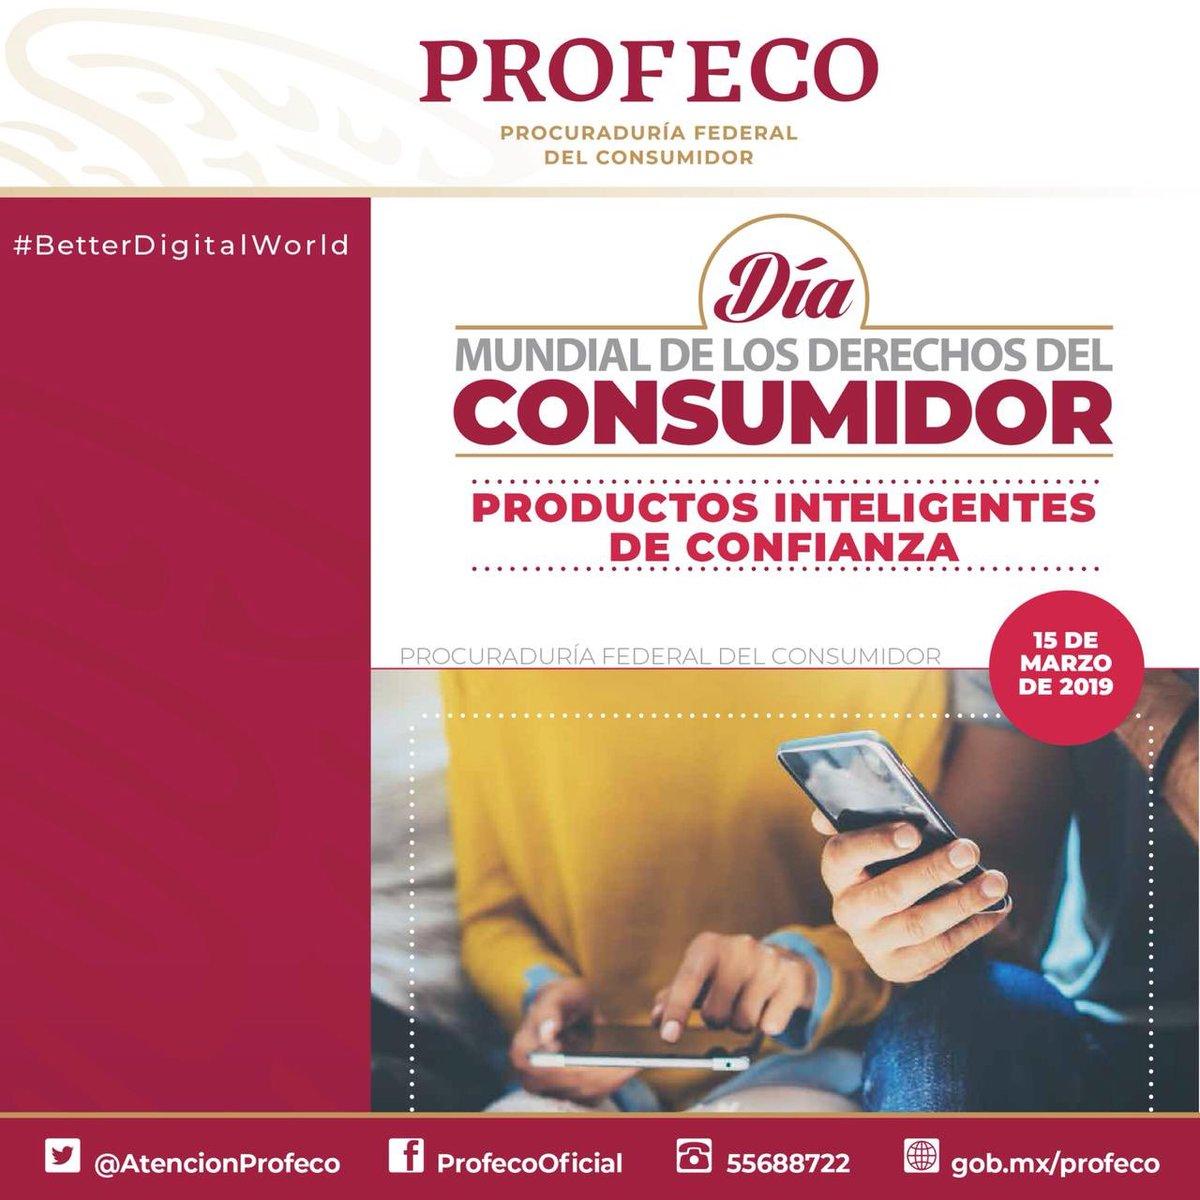 Alejandra Gallardo's photo on Consumidores